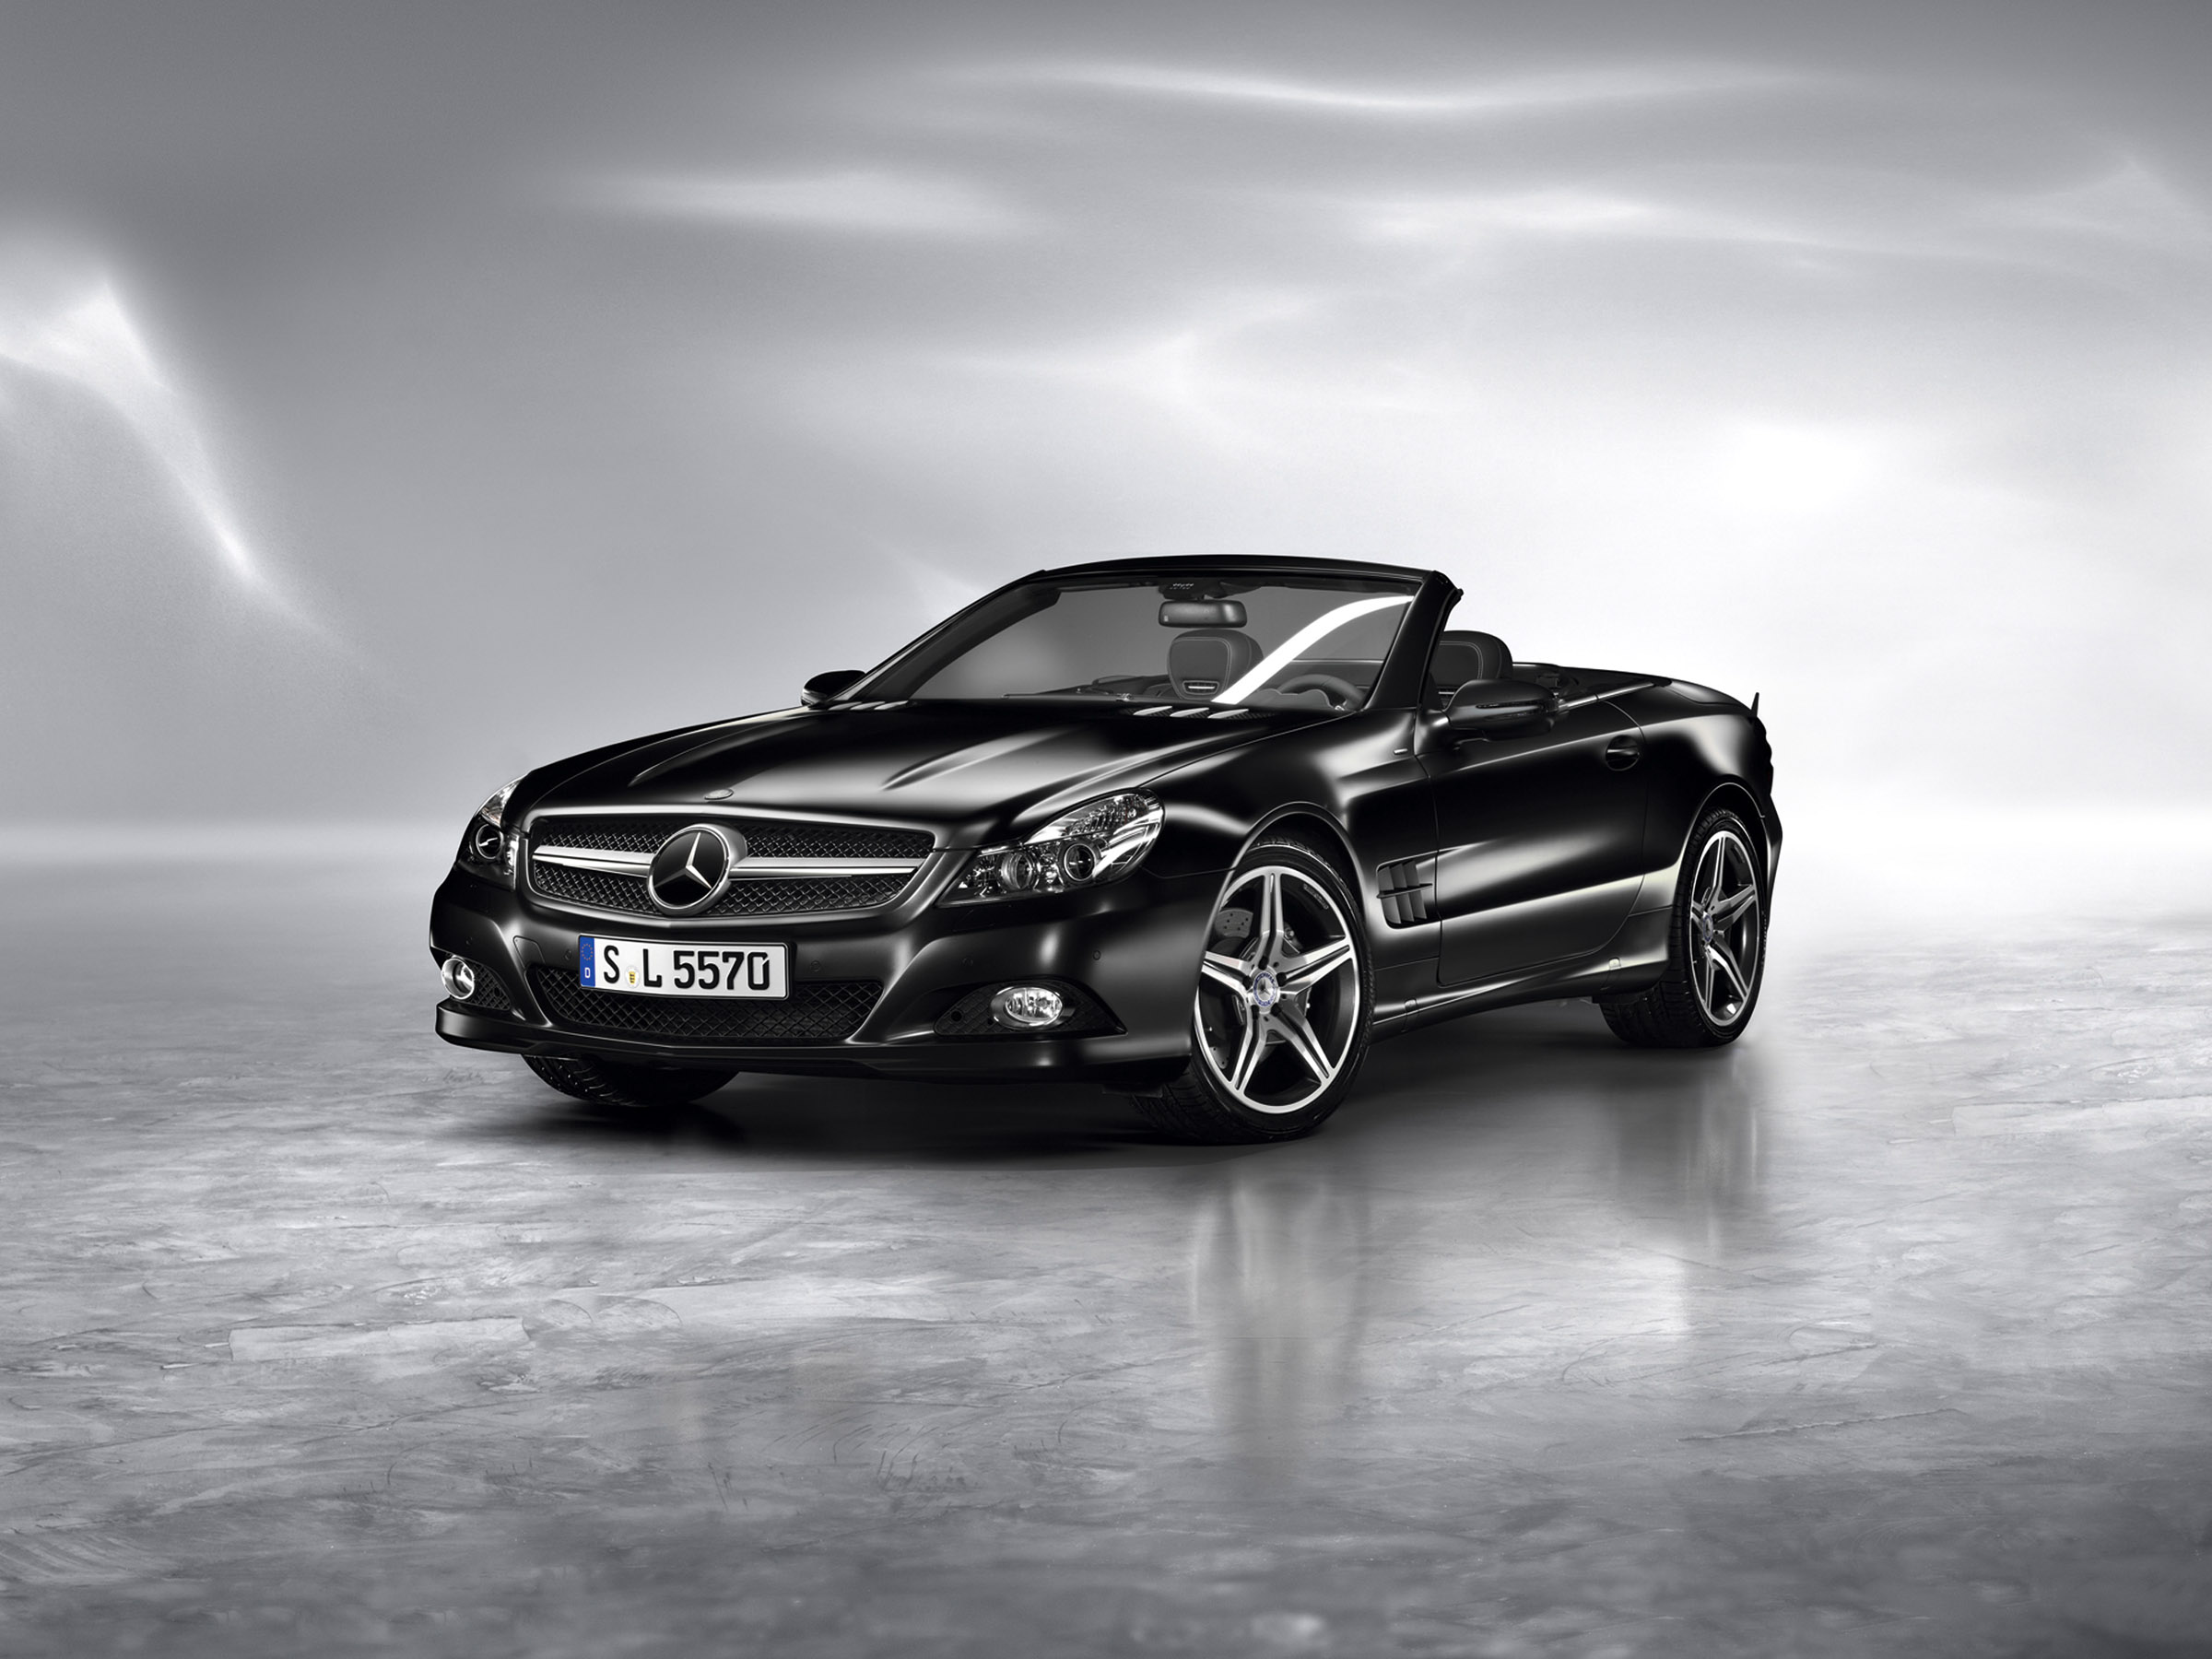 Mercedes-Benz представила SL Night Edition и SLK Grand Edition родстеров - фотография №1